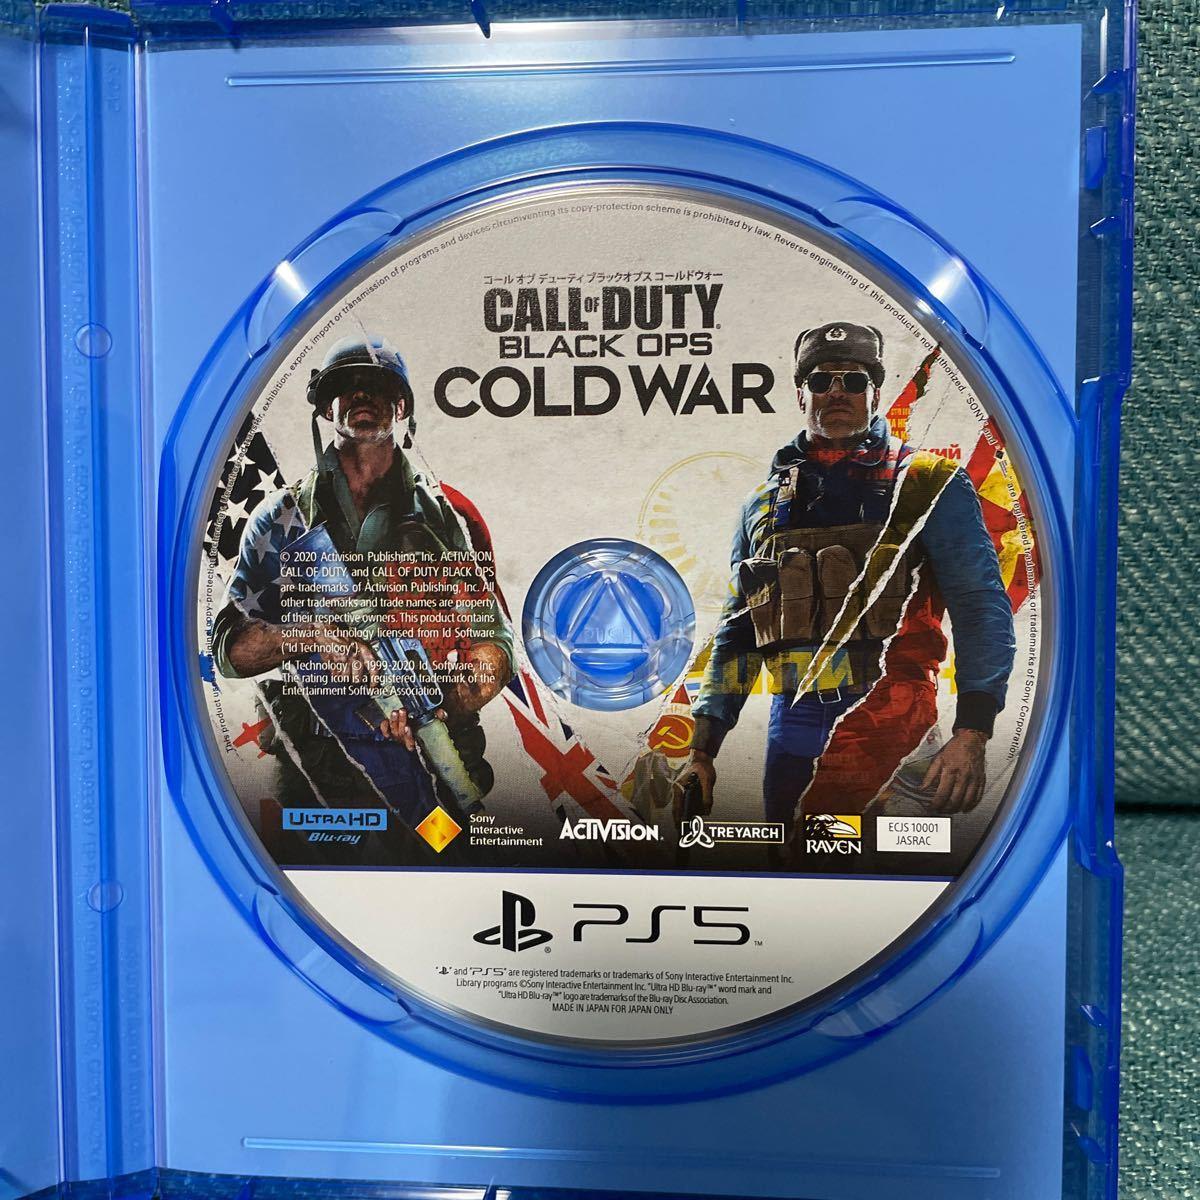 Call of Duty:Black Ops Cold War (コール オブ デューティ ブラックオプス コールドウォー)